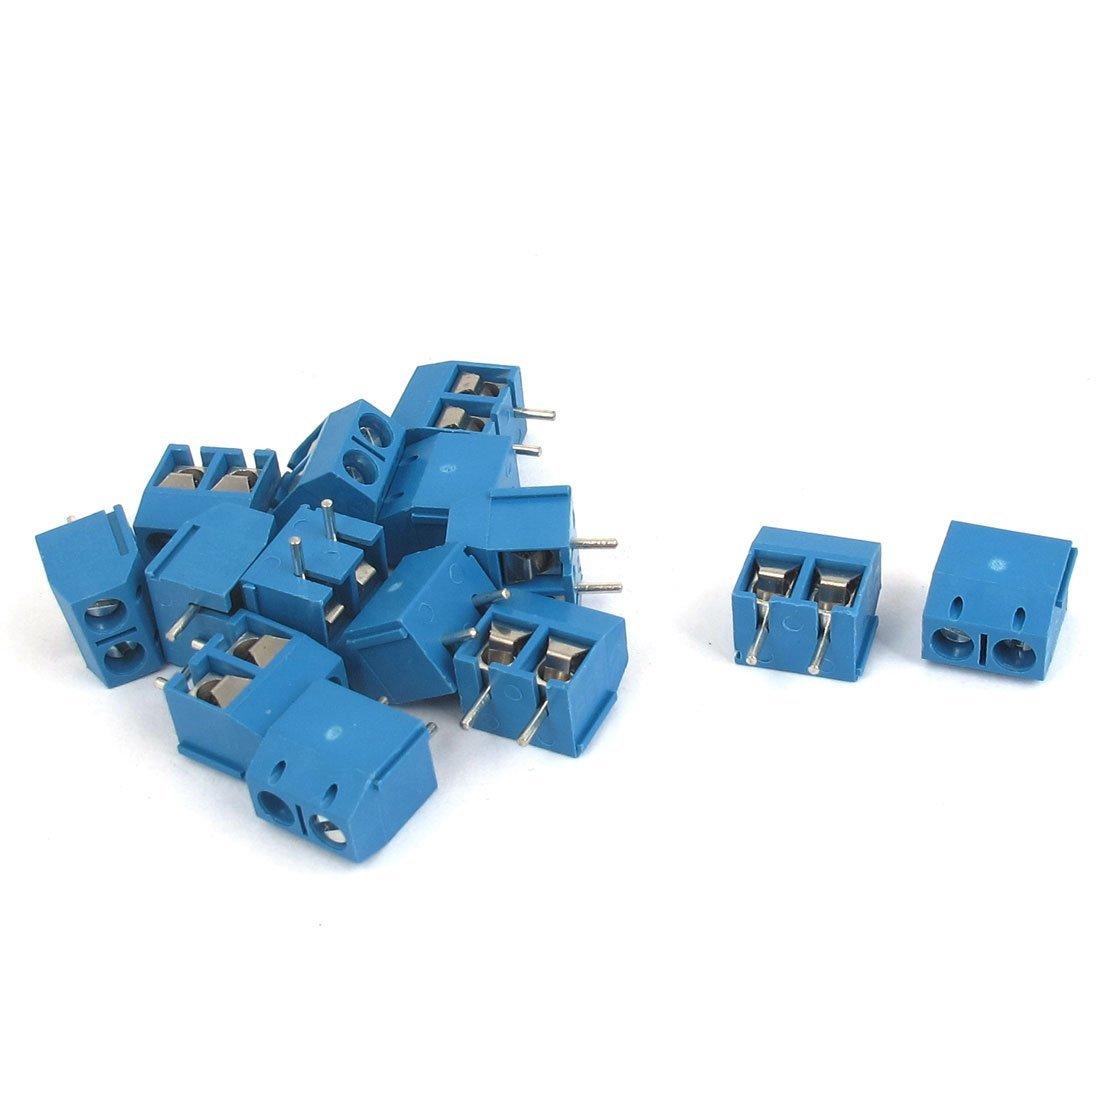 uxcell 2P 5mm Pitch PCB Mounting Screw Terminal Block AC 300V 10A 14pcs